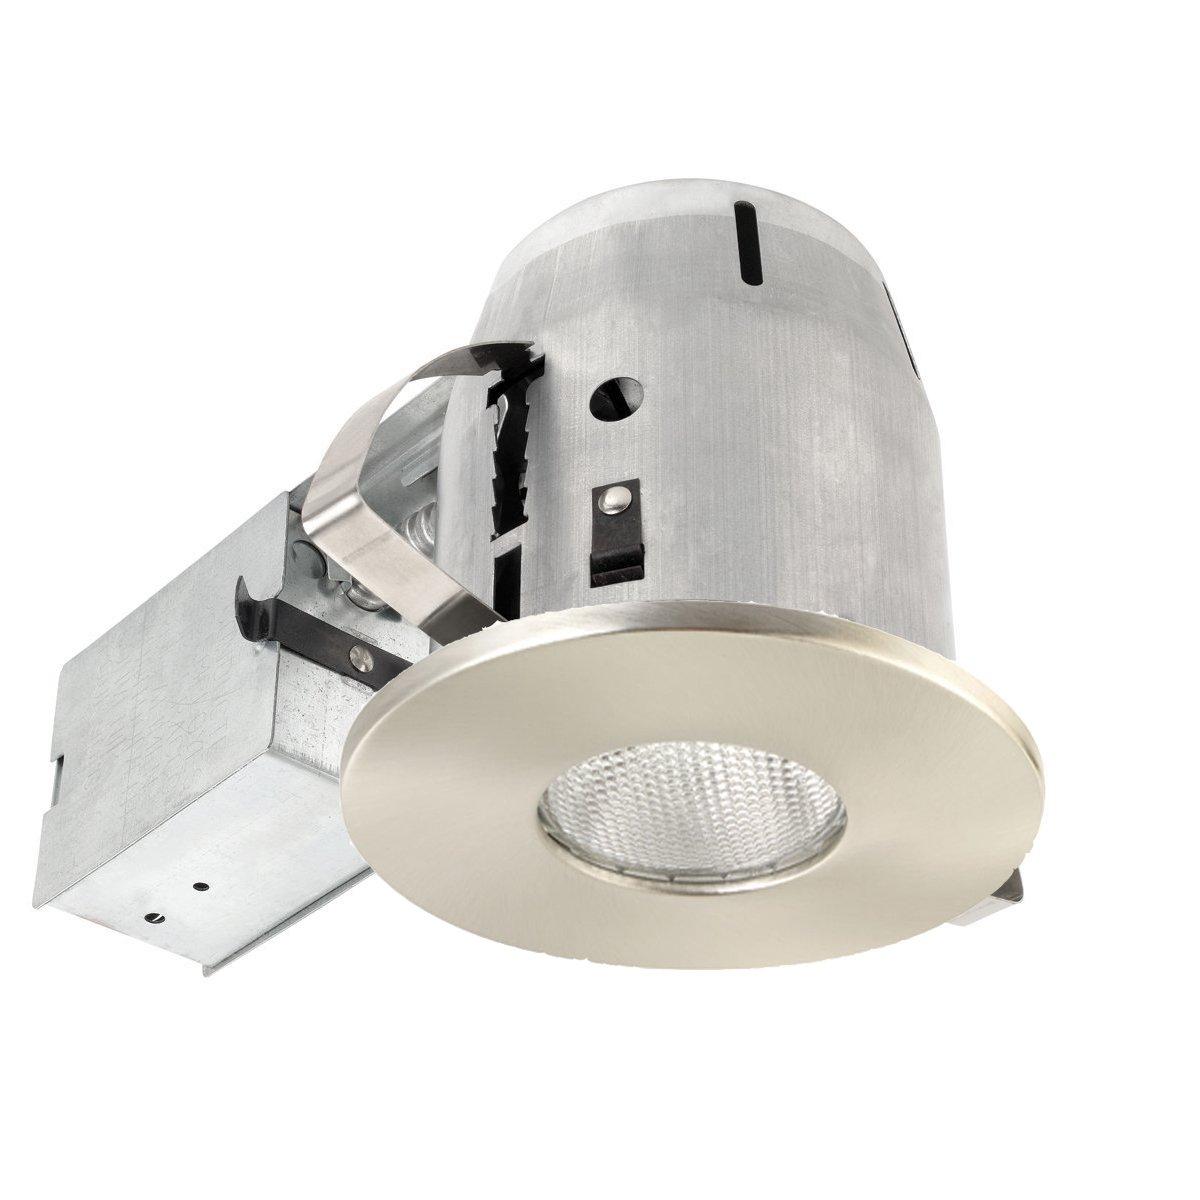 Globe Electric 9248601 4 inch Recessed Lighting Kit, Brushed Nickel Finish, Flood Light